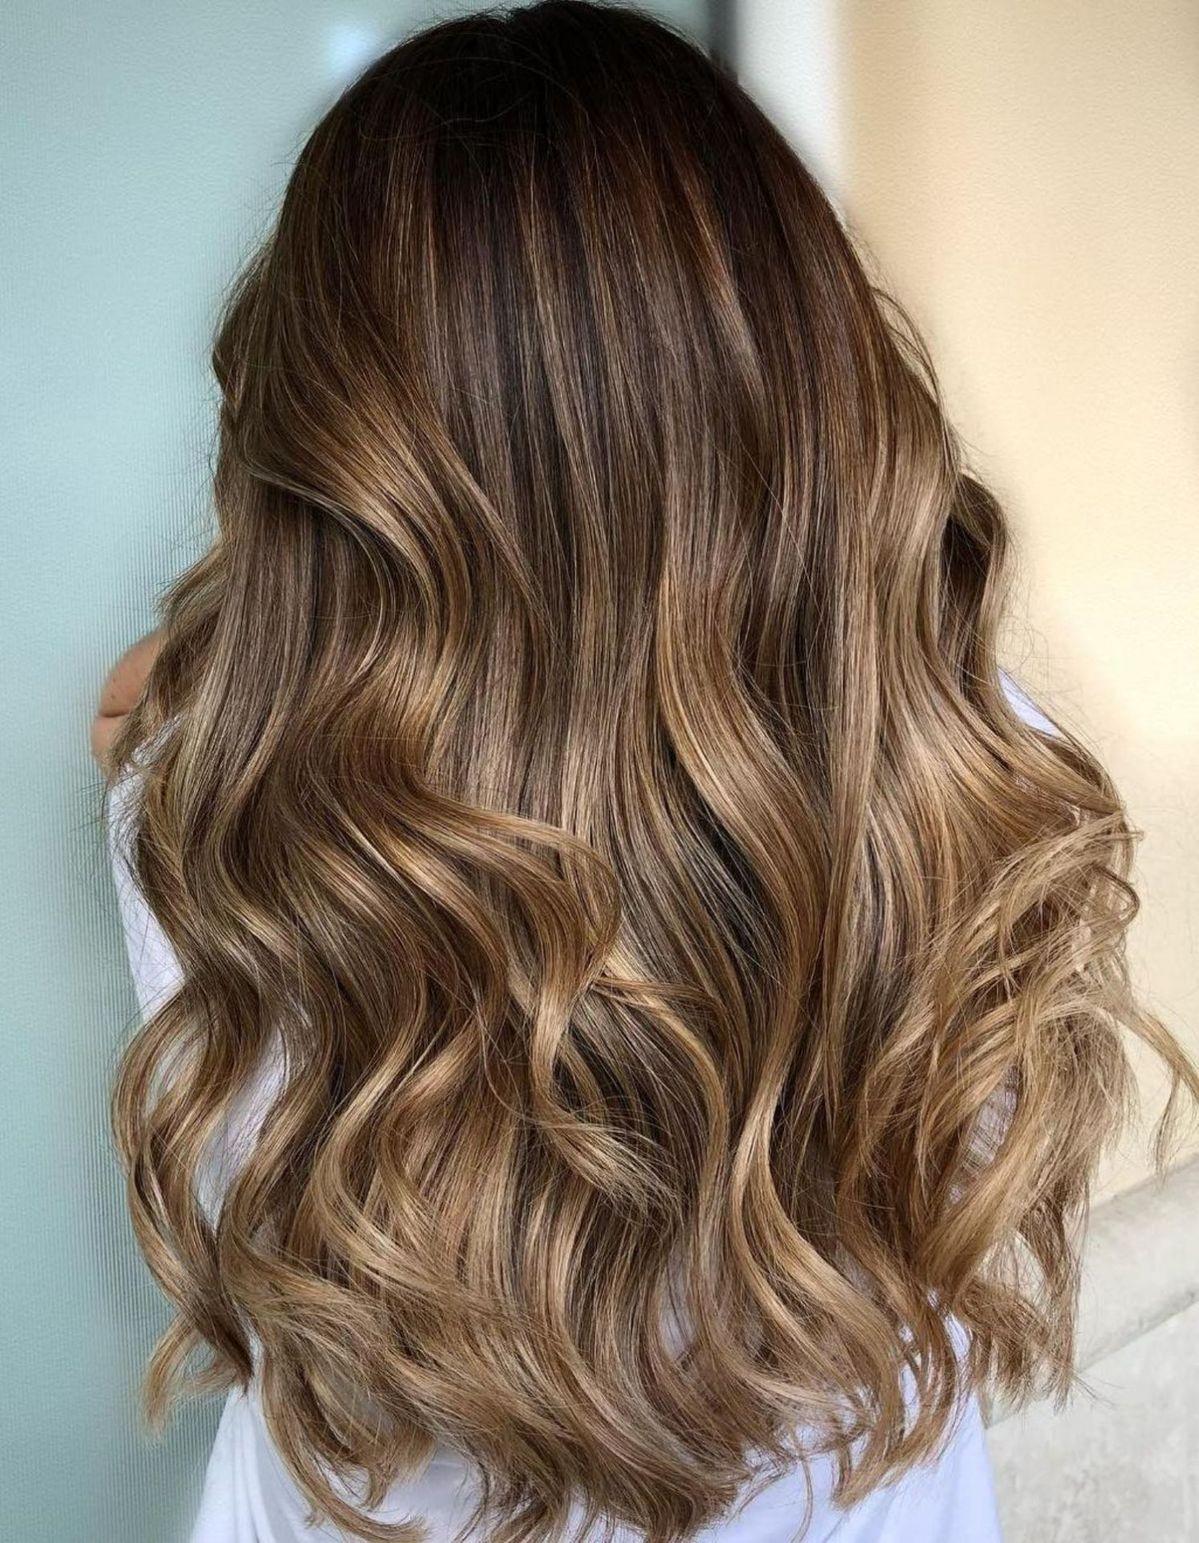 Subtle Shiny Balayage For Medium Brown Hair